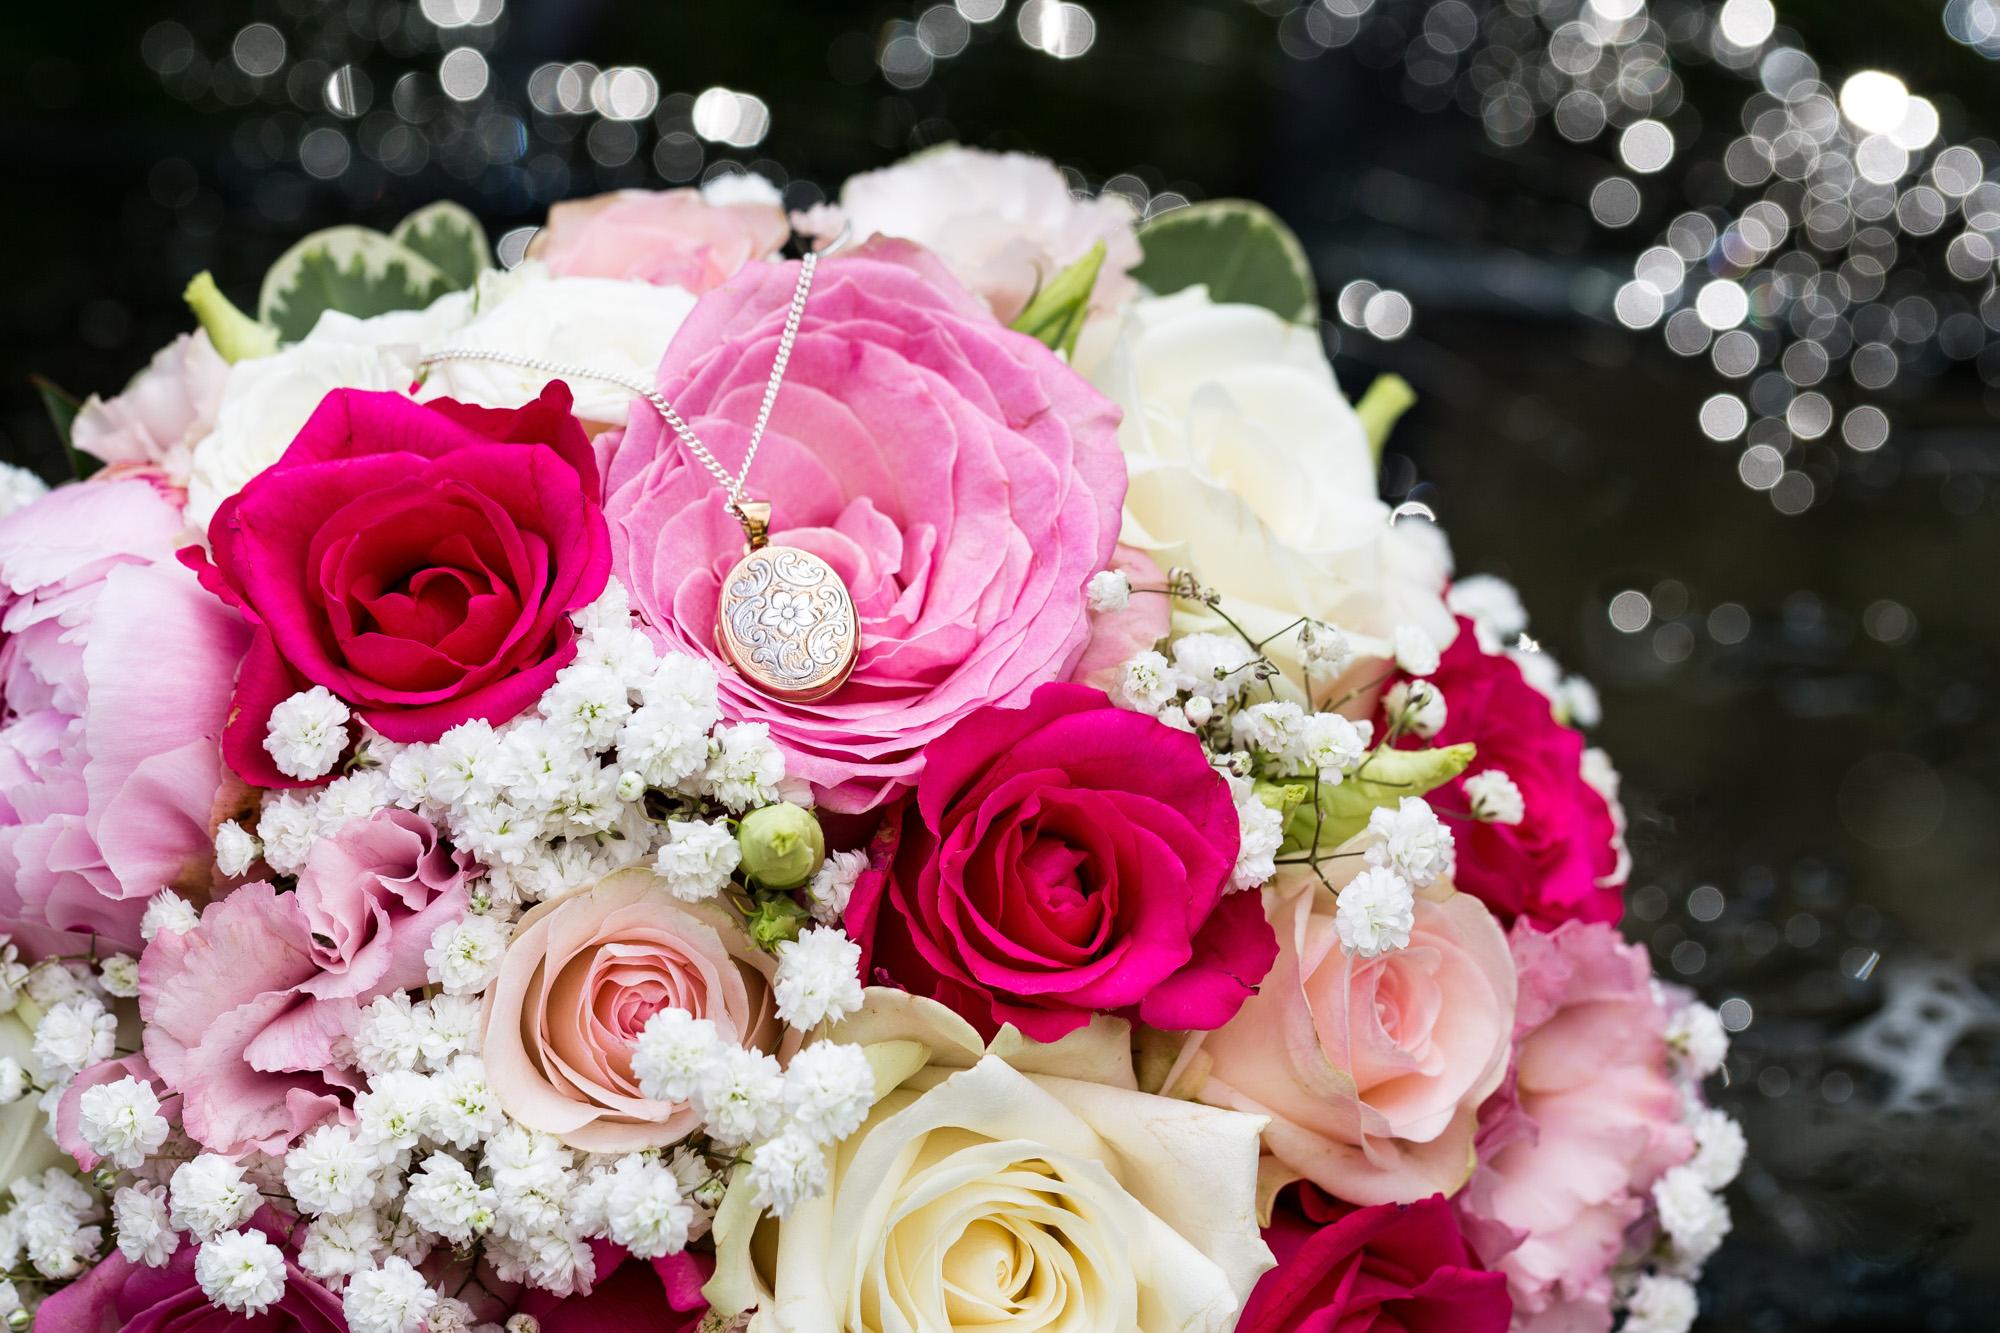 wedding bouquet and locket